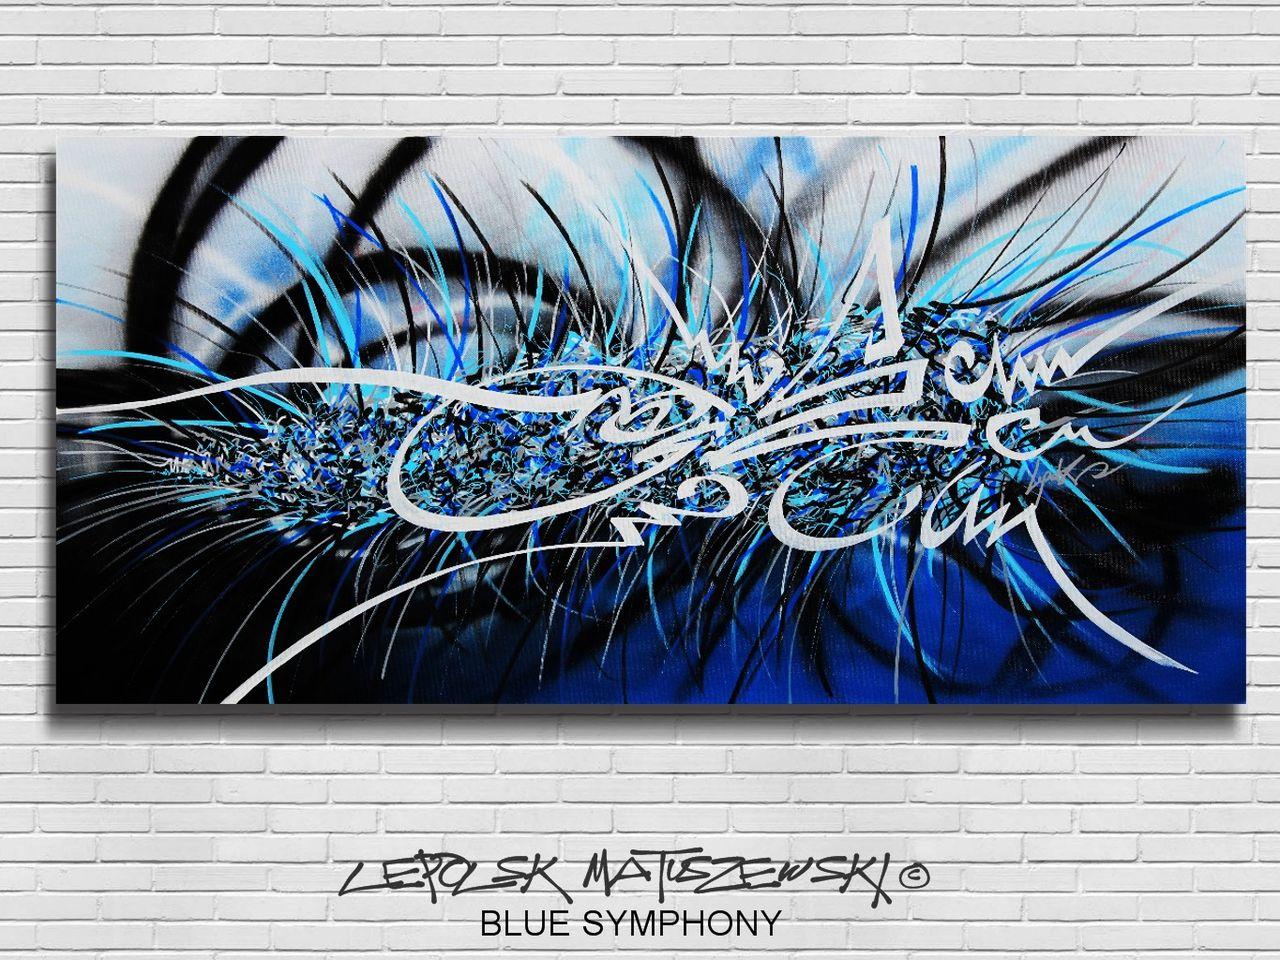 MK  Lepolsk Matuszewski BLUE SYMPHONY  street art calligraffiti graffiti abstrait